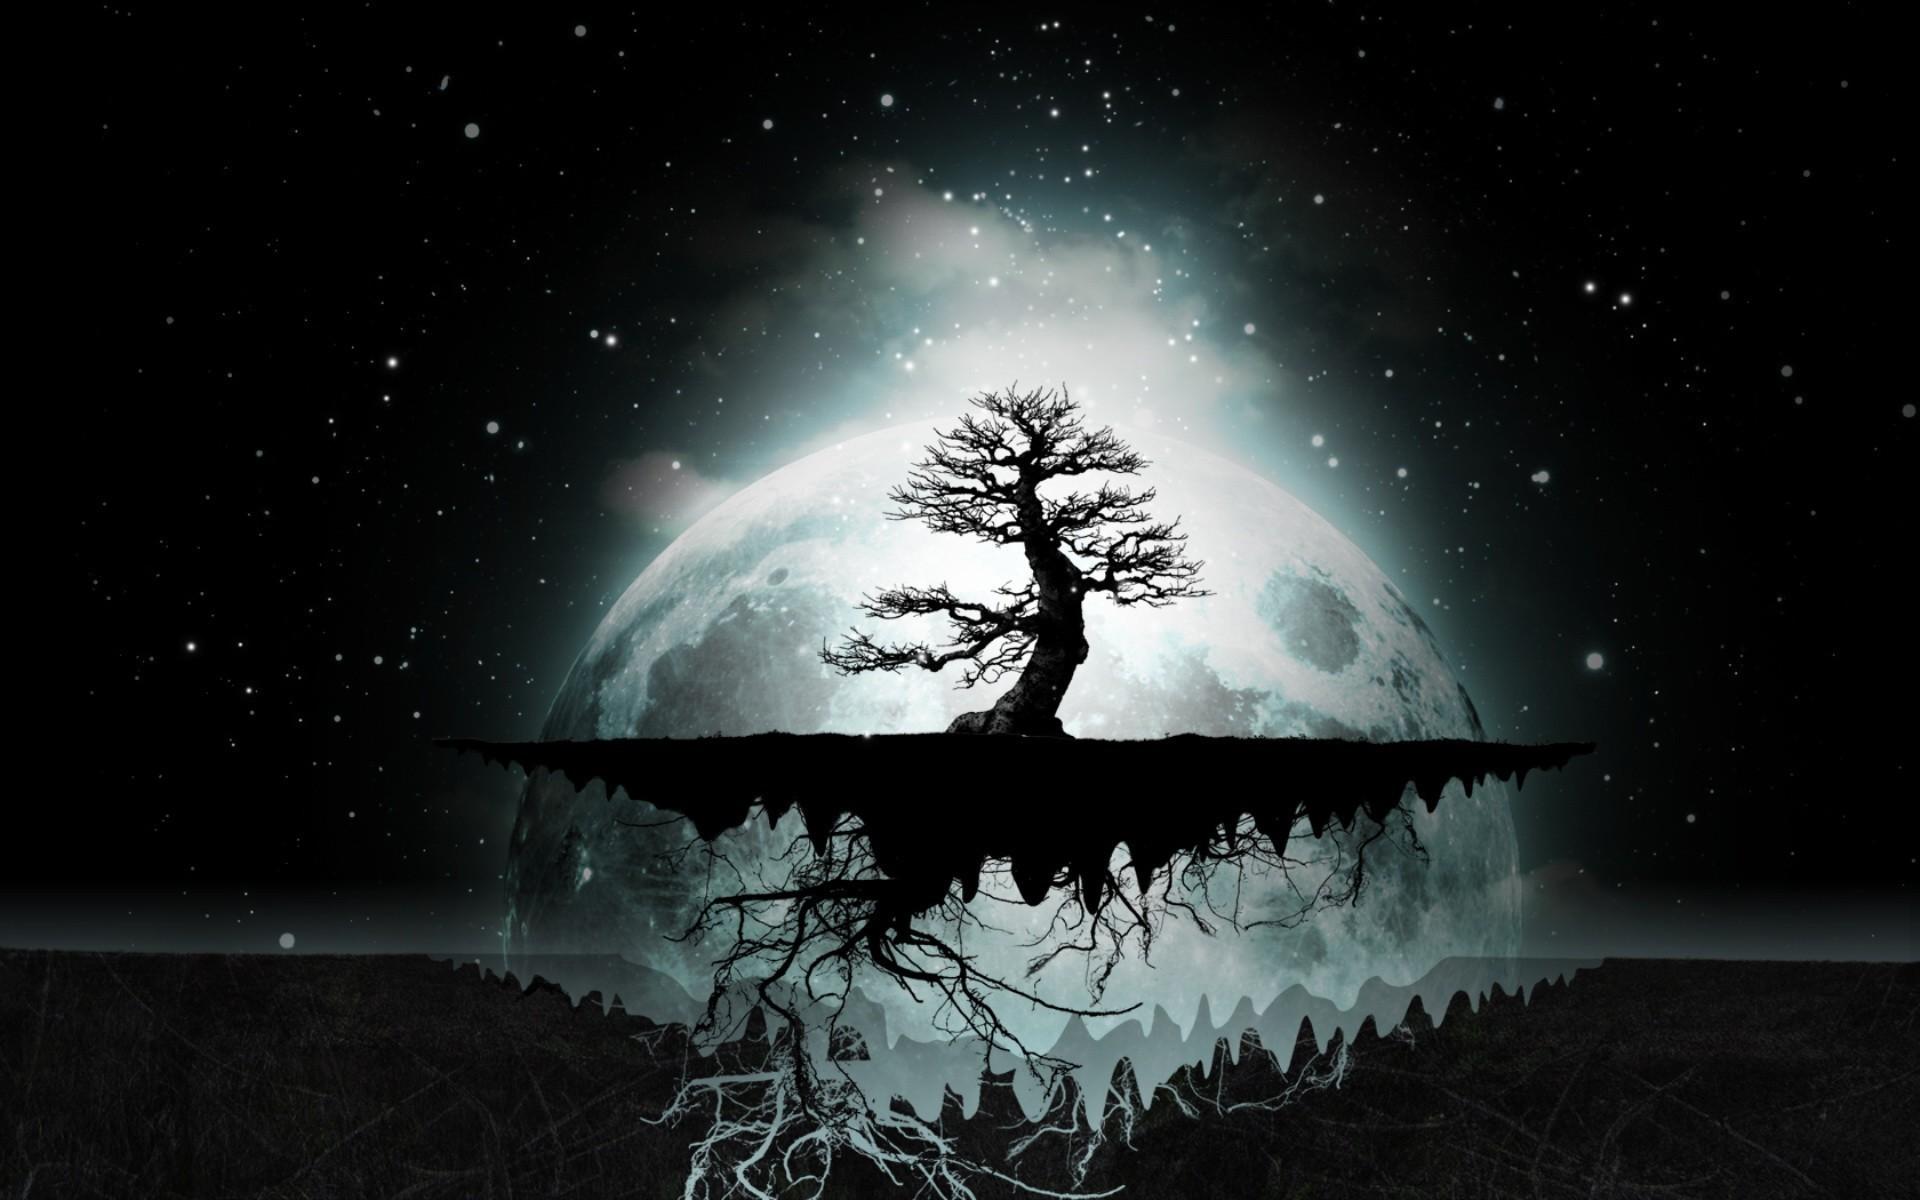 1920x1200, Moon Abstract Artwork Dark Digital Art Wallpaper - Tree Of Life Computer Background - HD Wallpaper